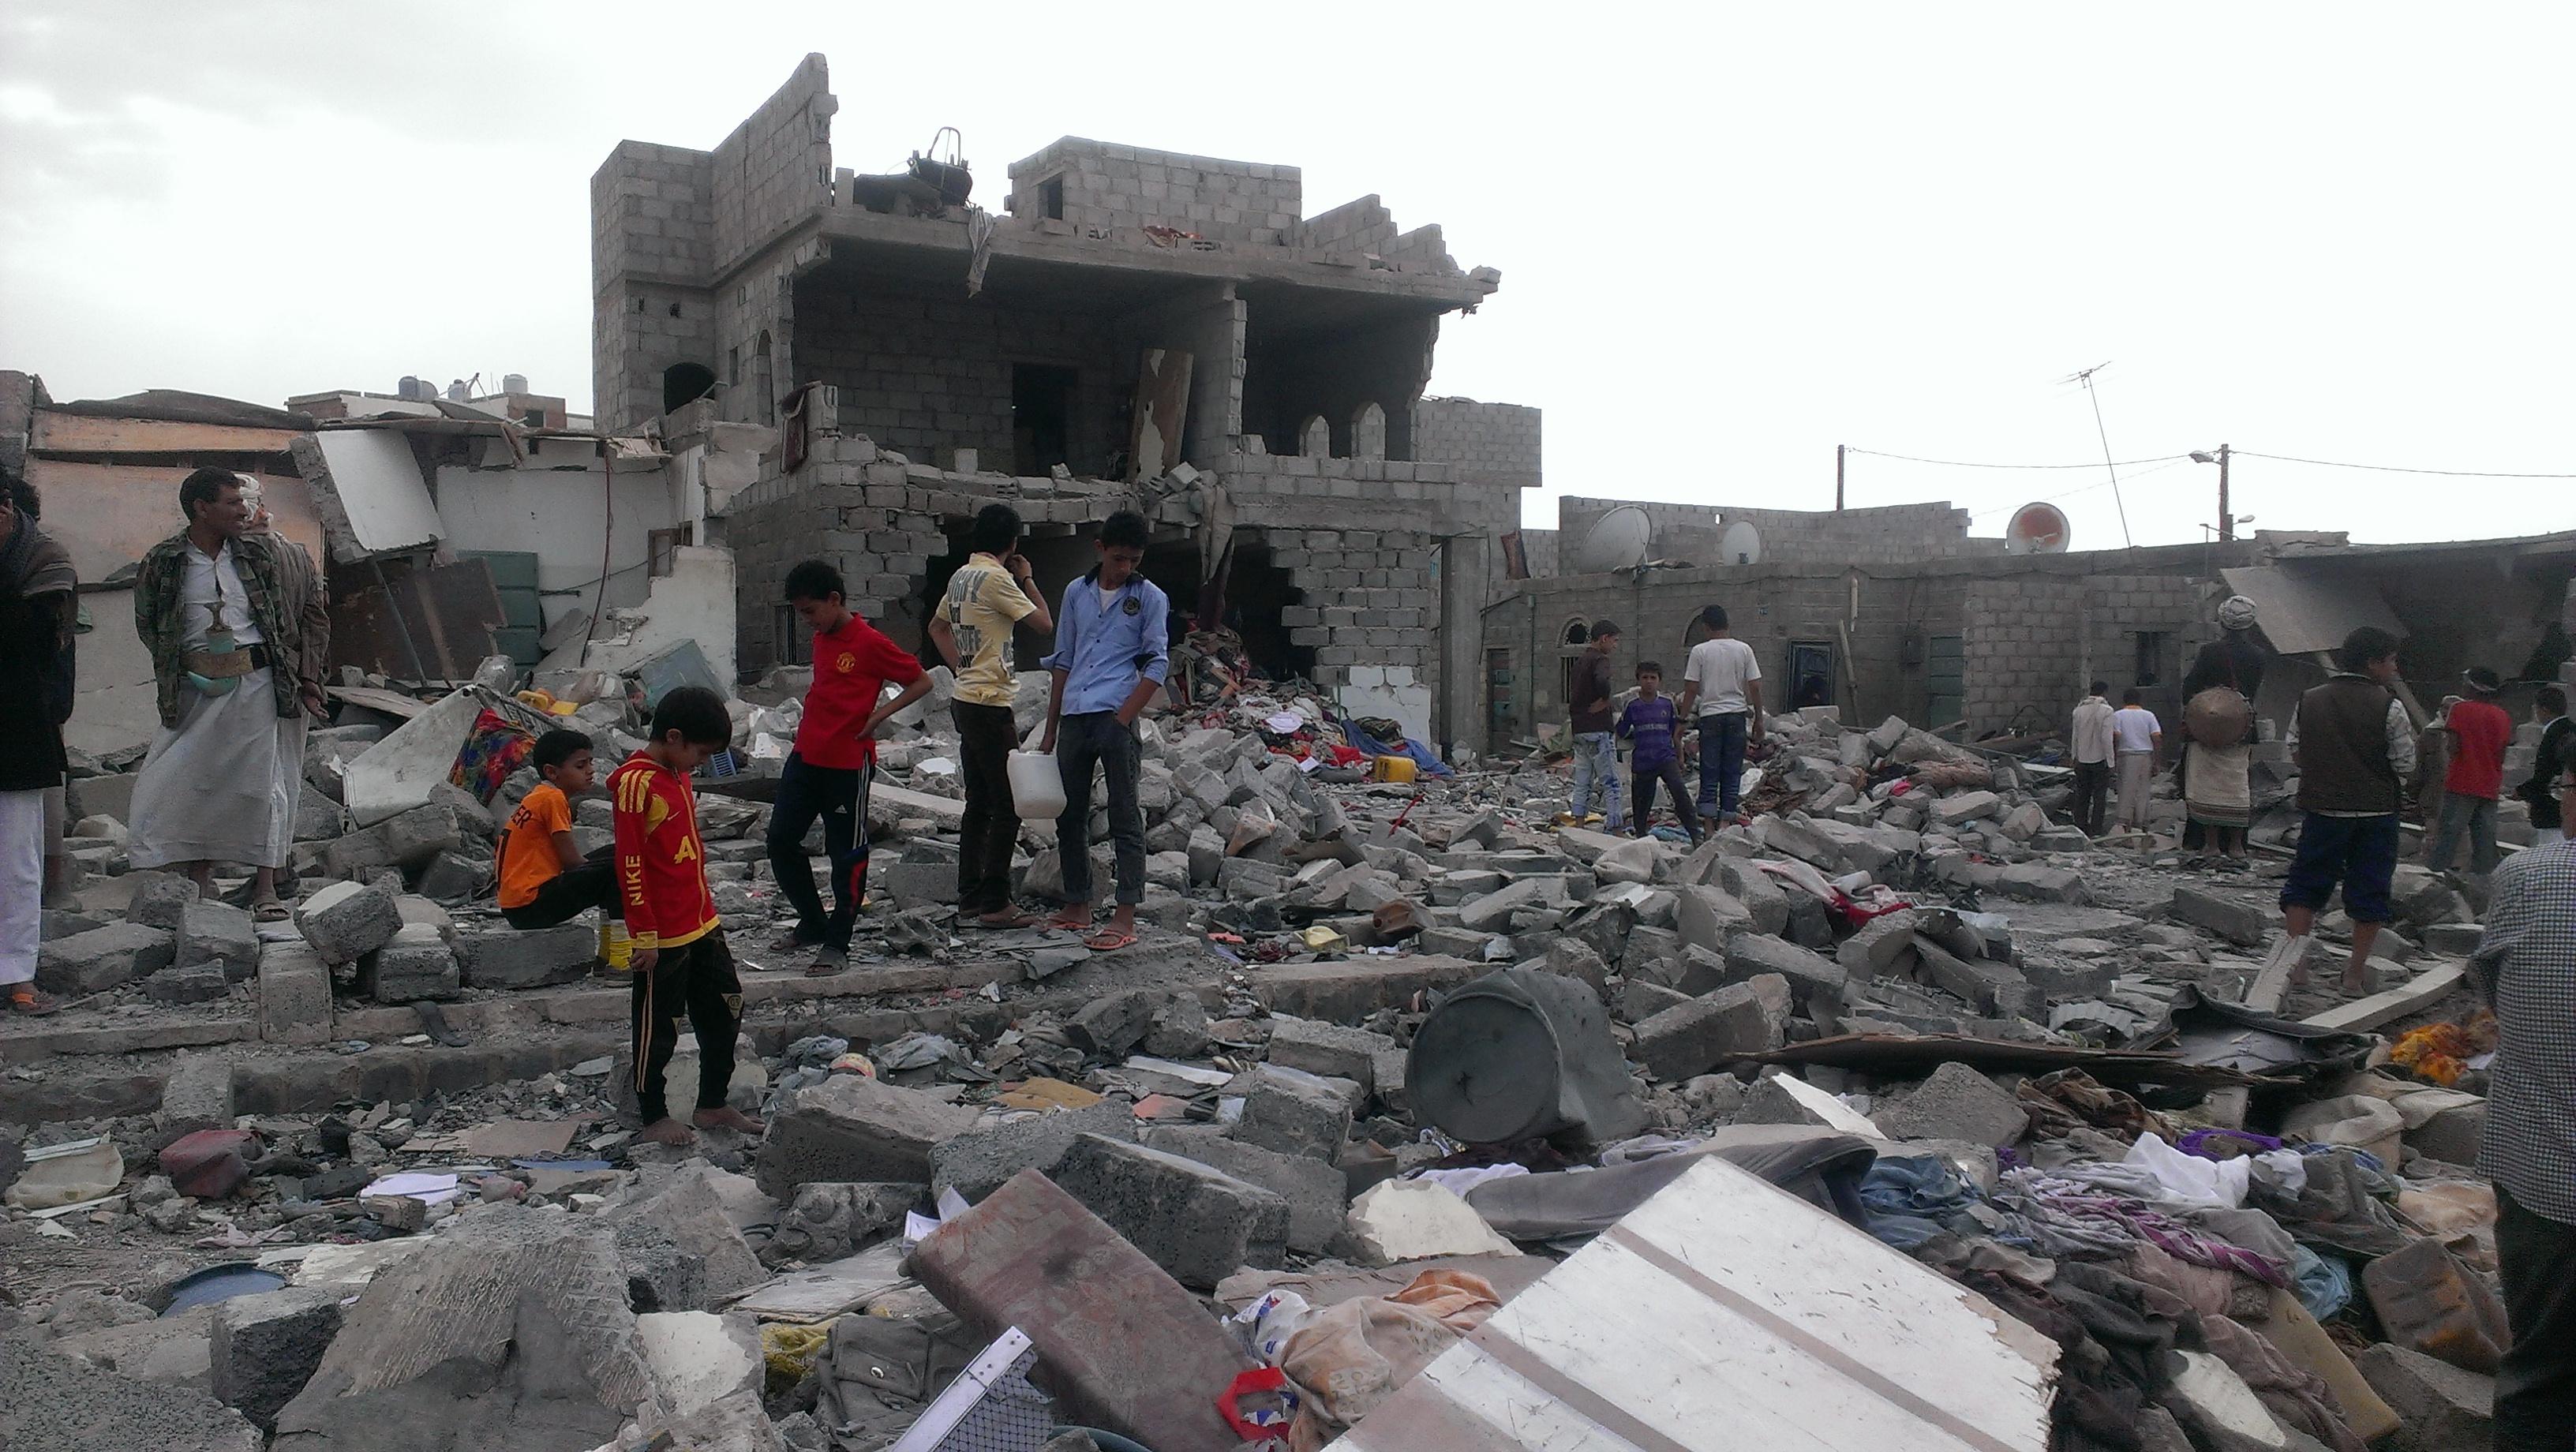 BBG, VOA honor freelance journalist killed in Yemen